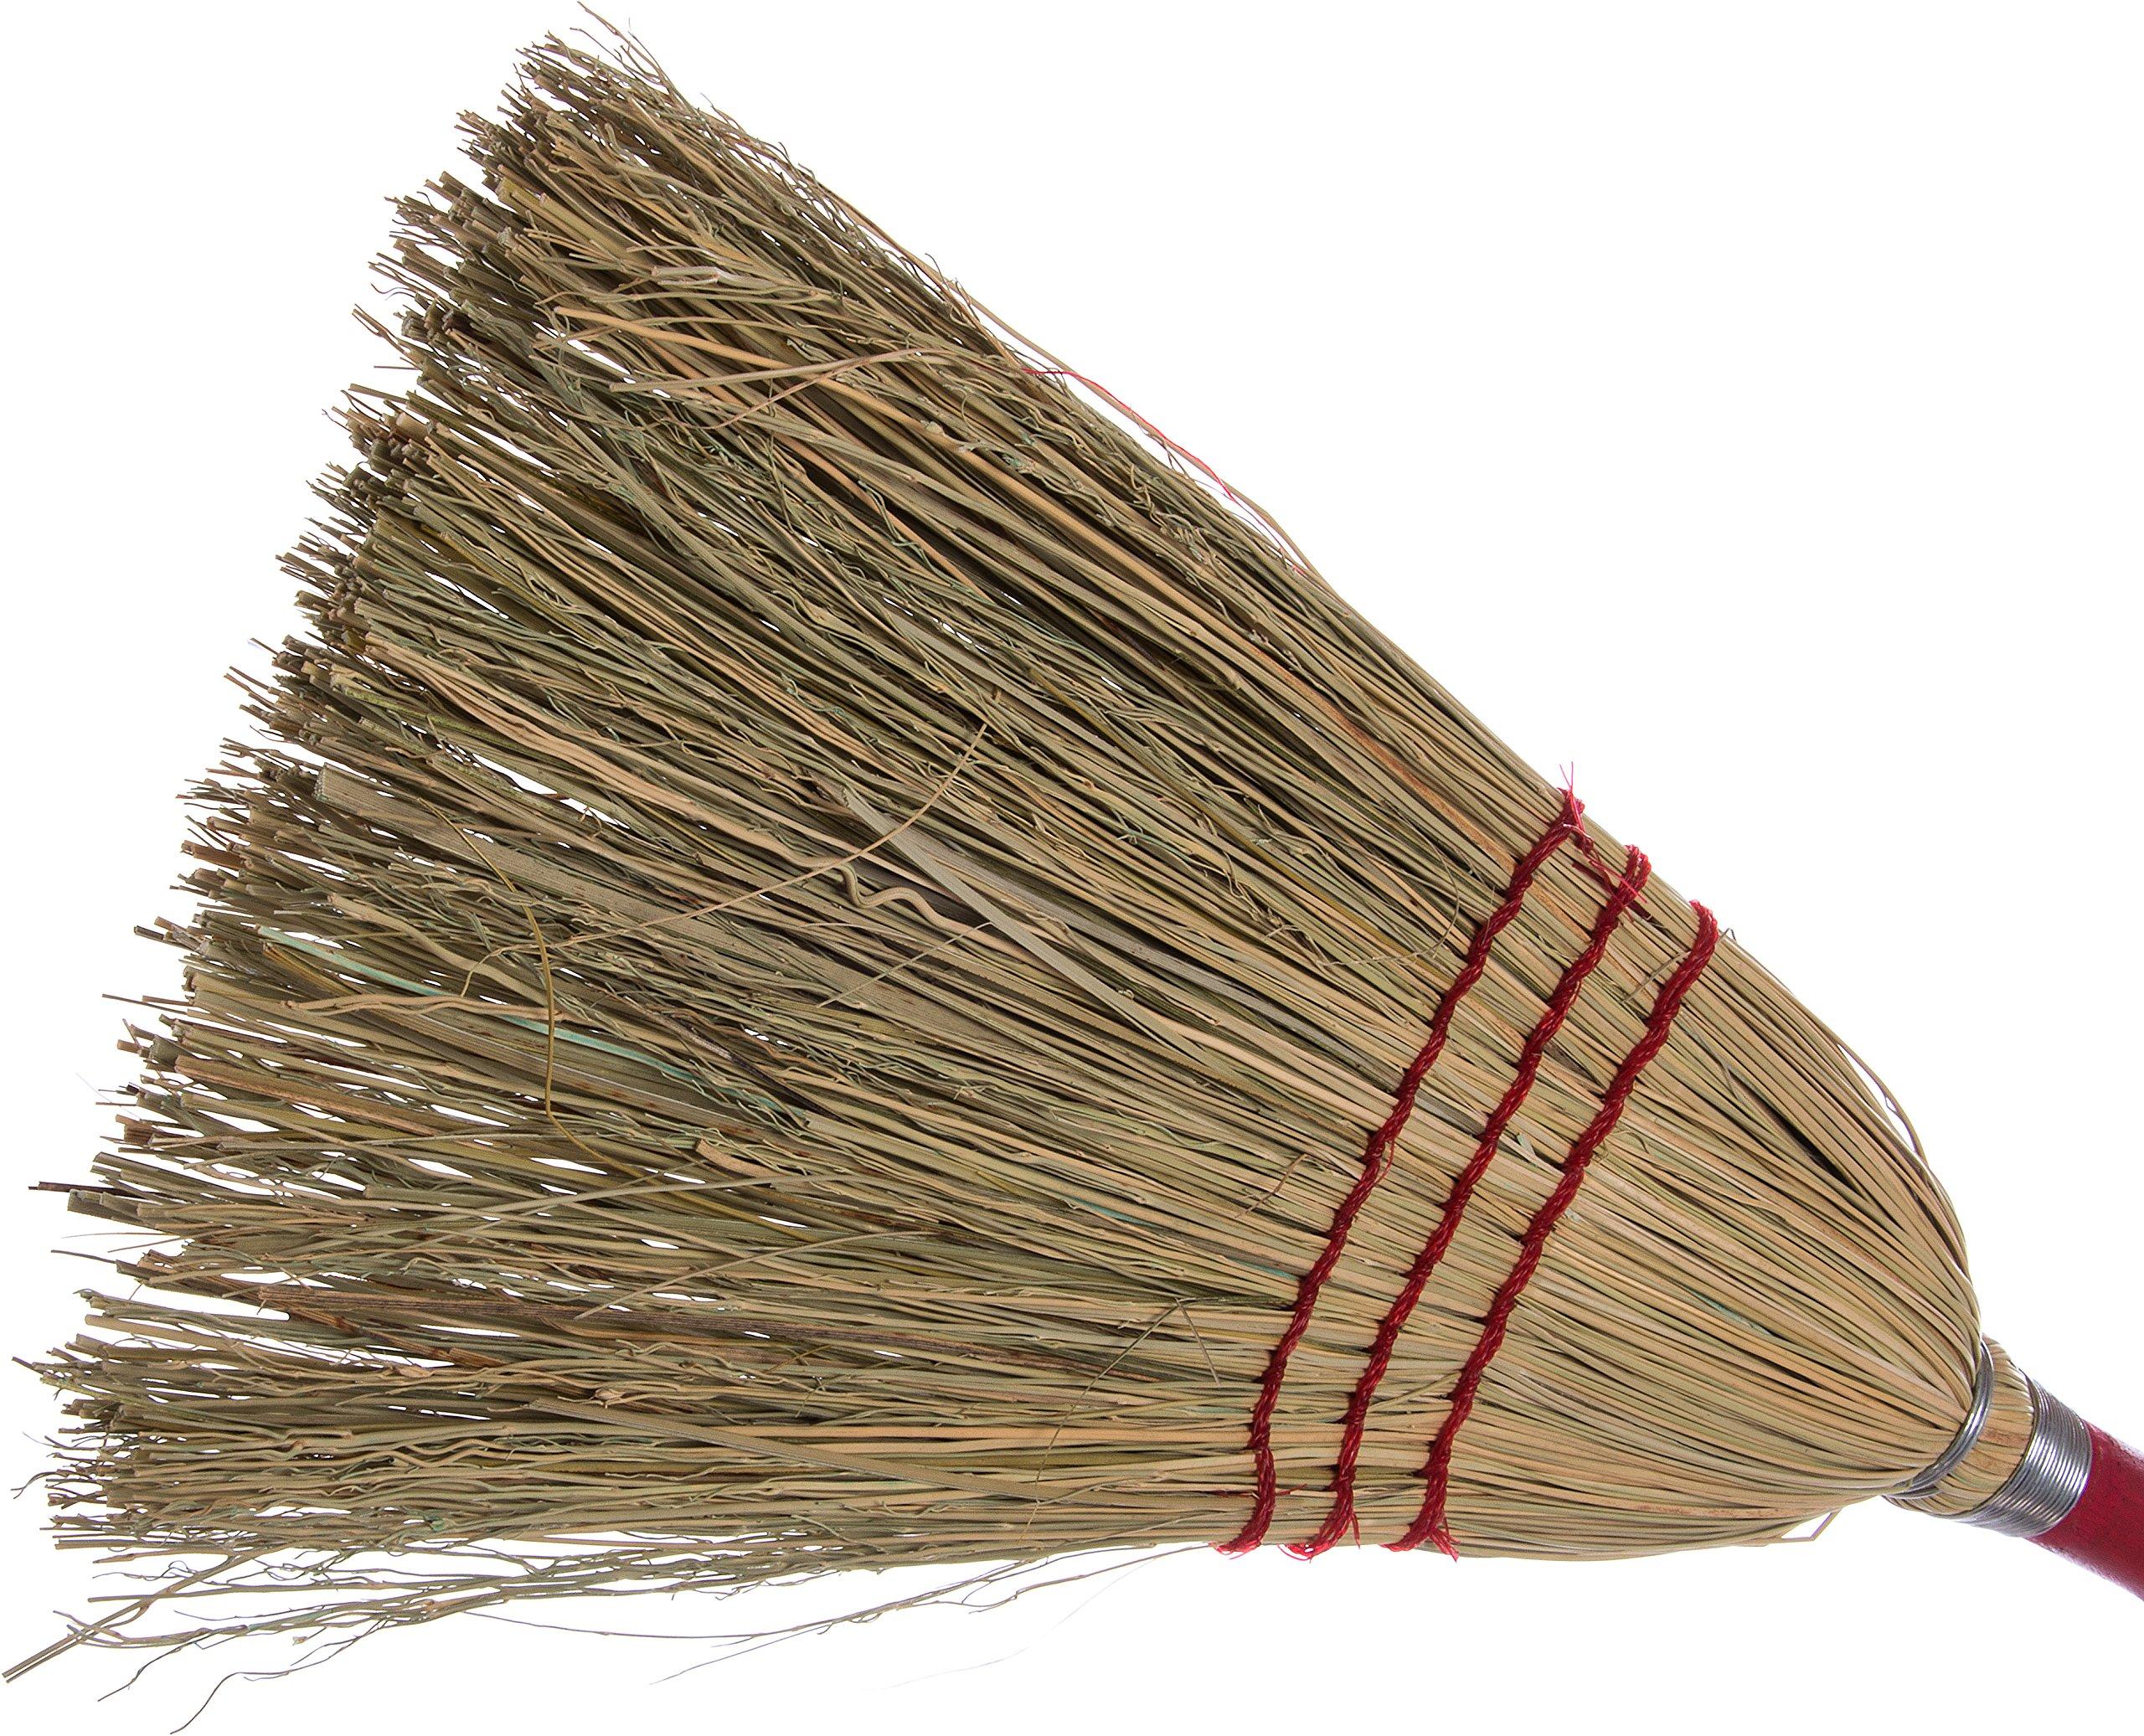 Carlisle 368200 Flo-Pac Lobby Corn Brooms, Set of 12 (40-Inch, Corn Blend) by Carlisle (Image #2)